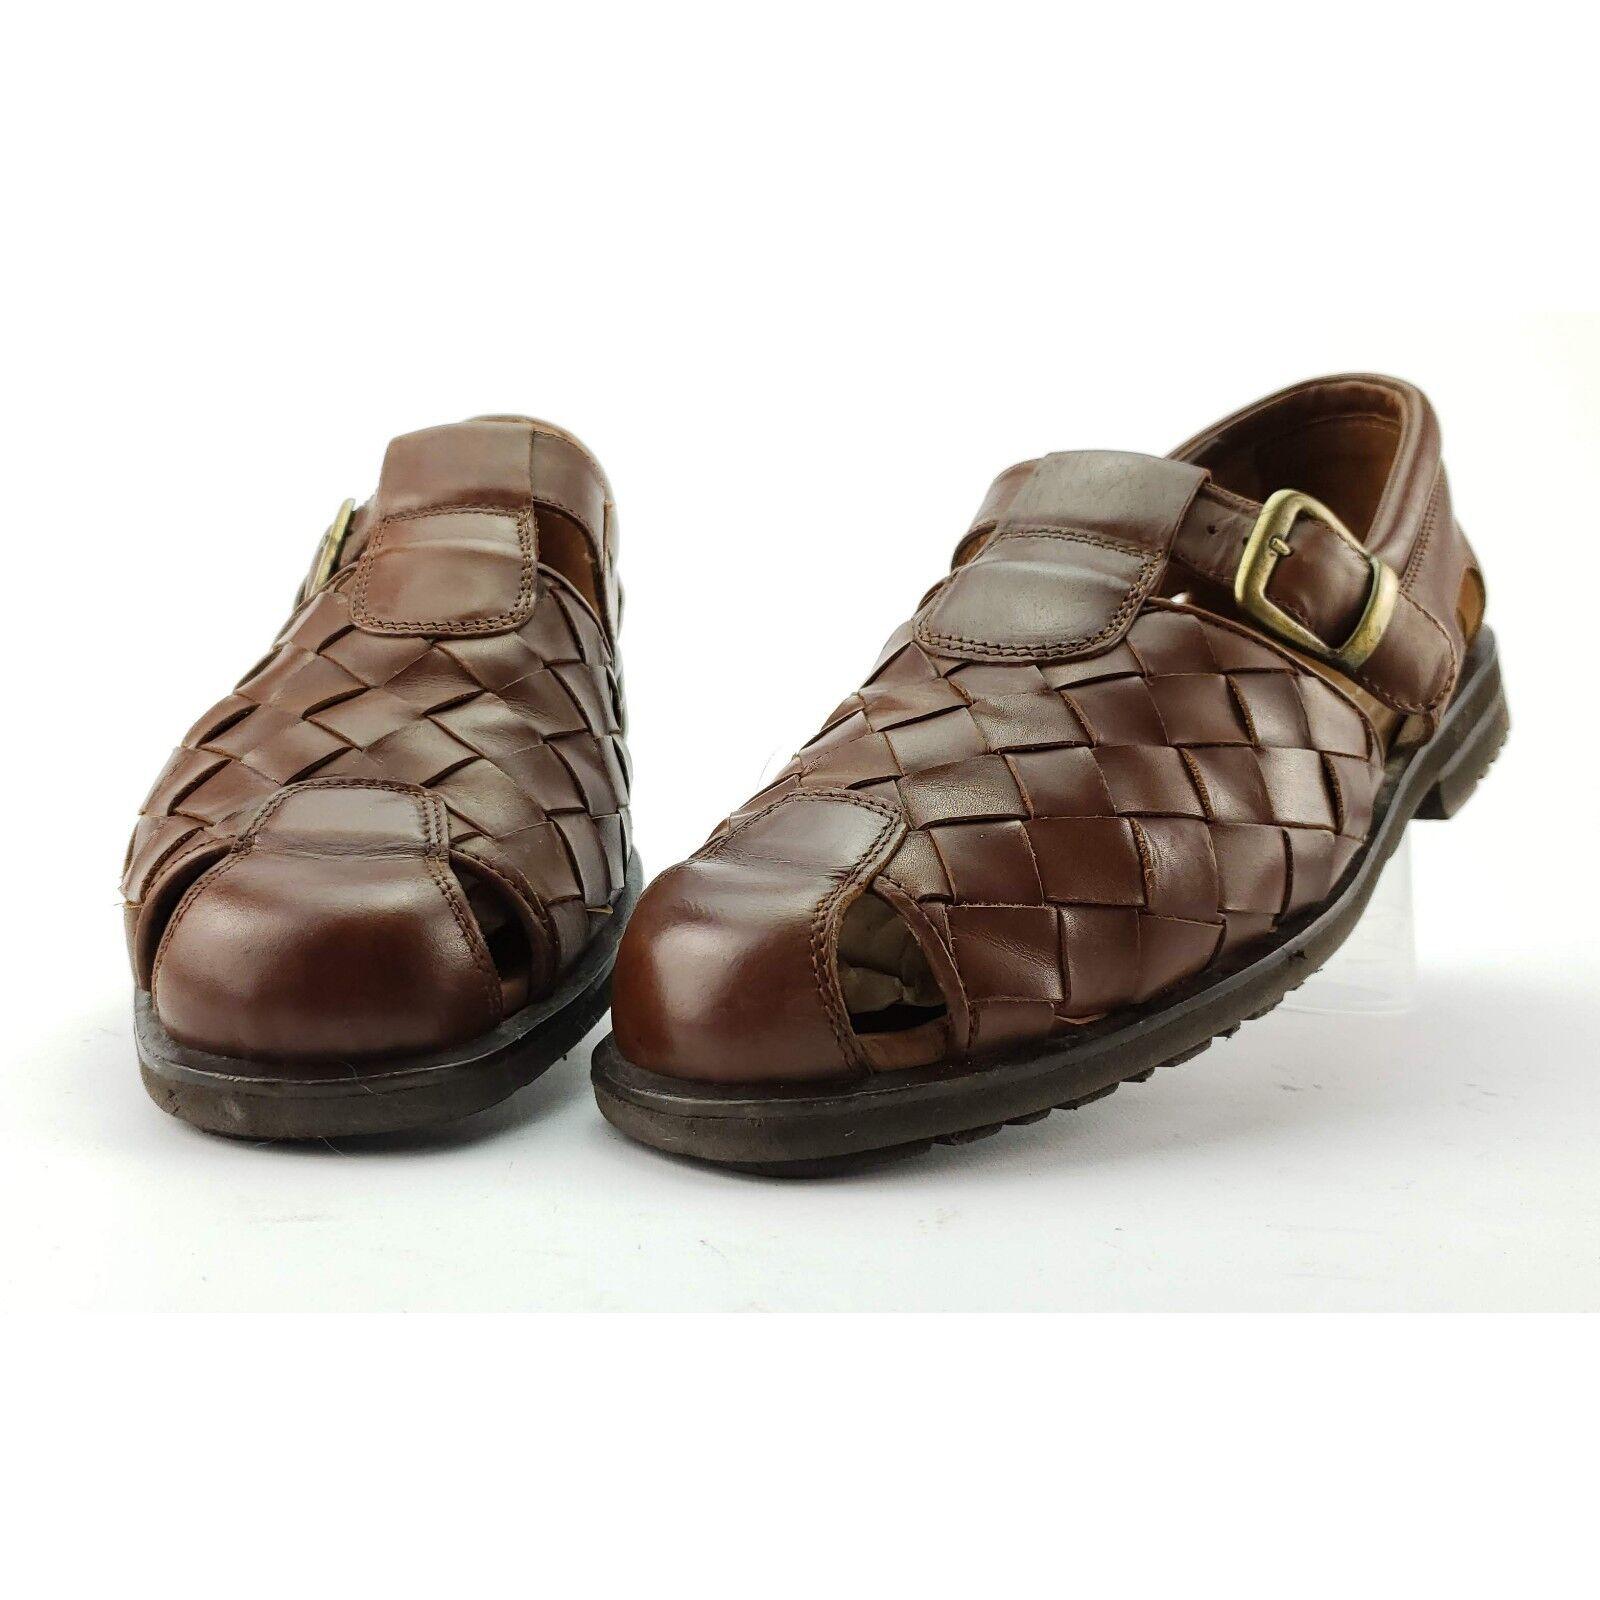 Allen Edmonds 'Tivoli' Men's 9.5 2E Brown Fisherman Woven Sandal Vibram 48016